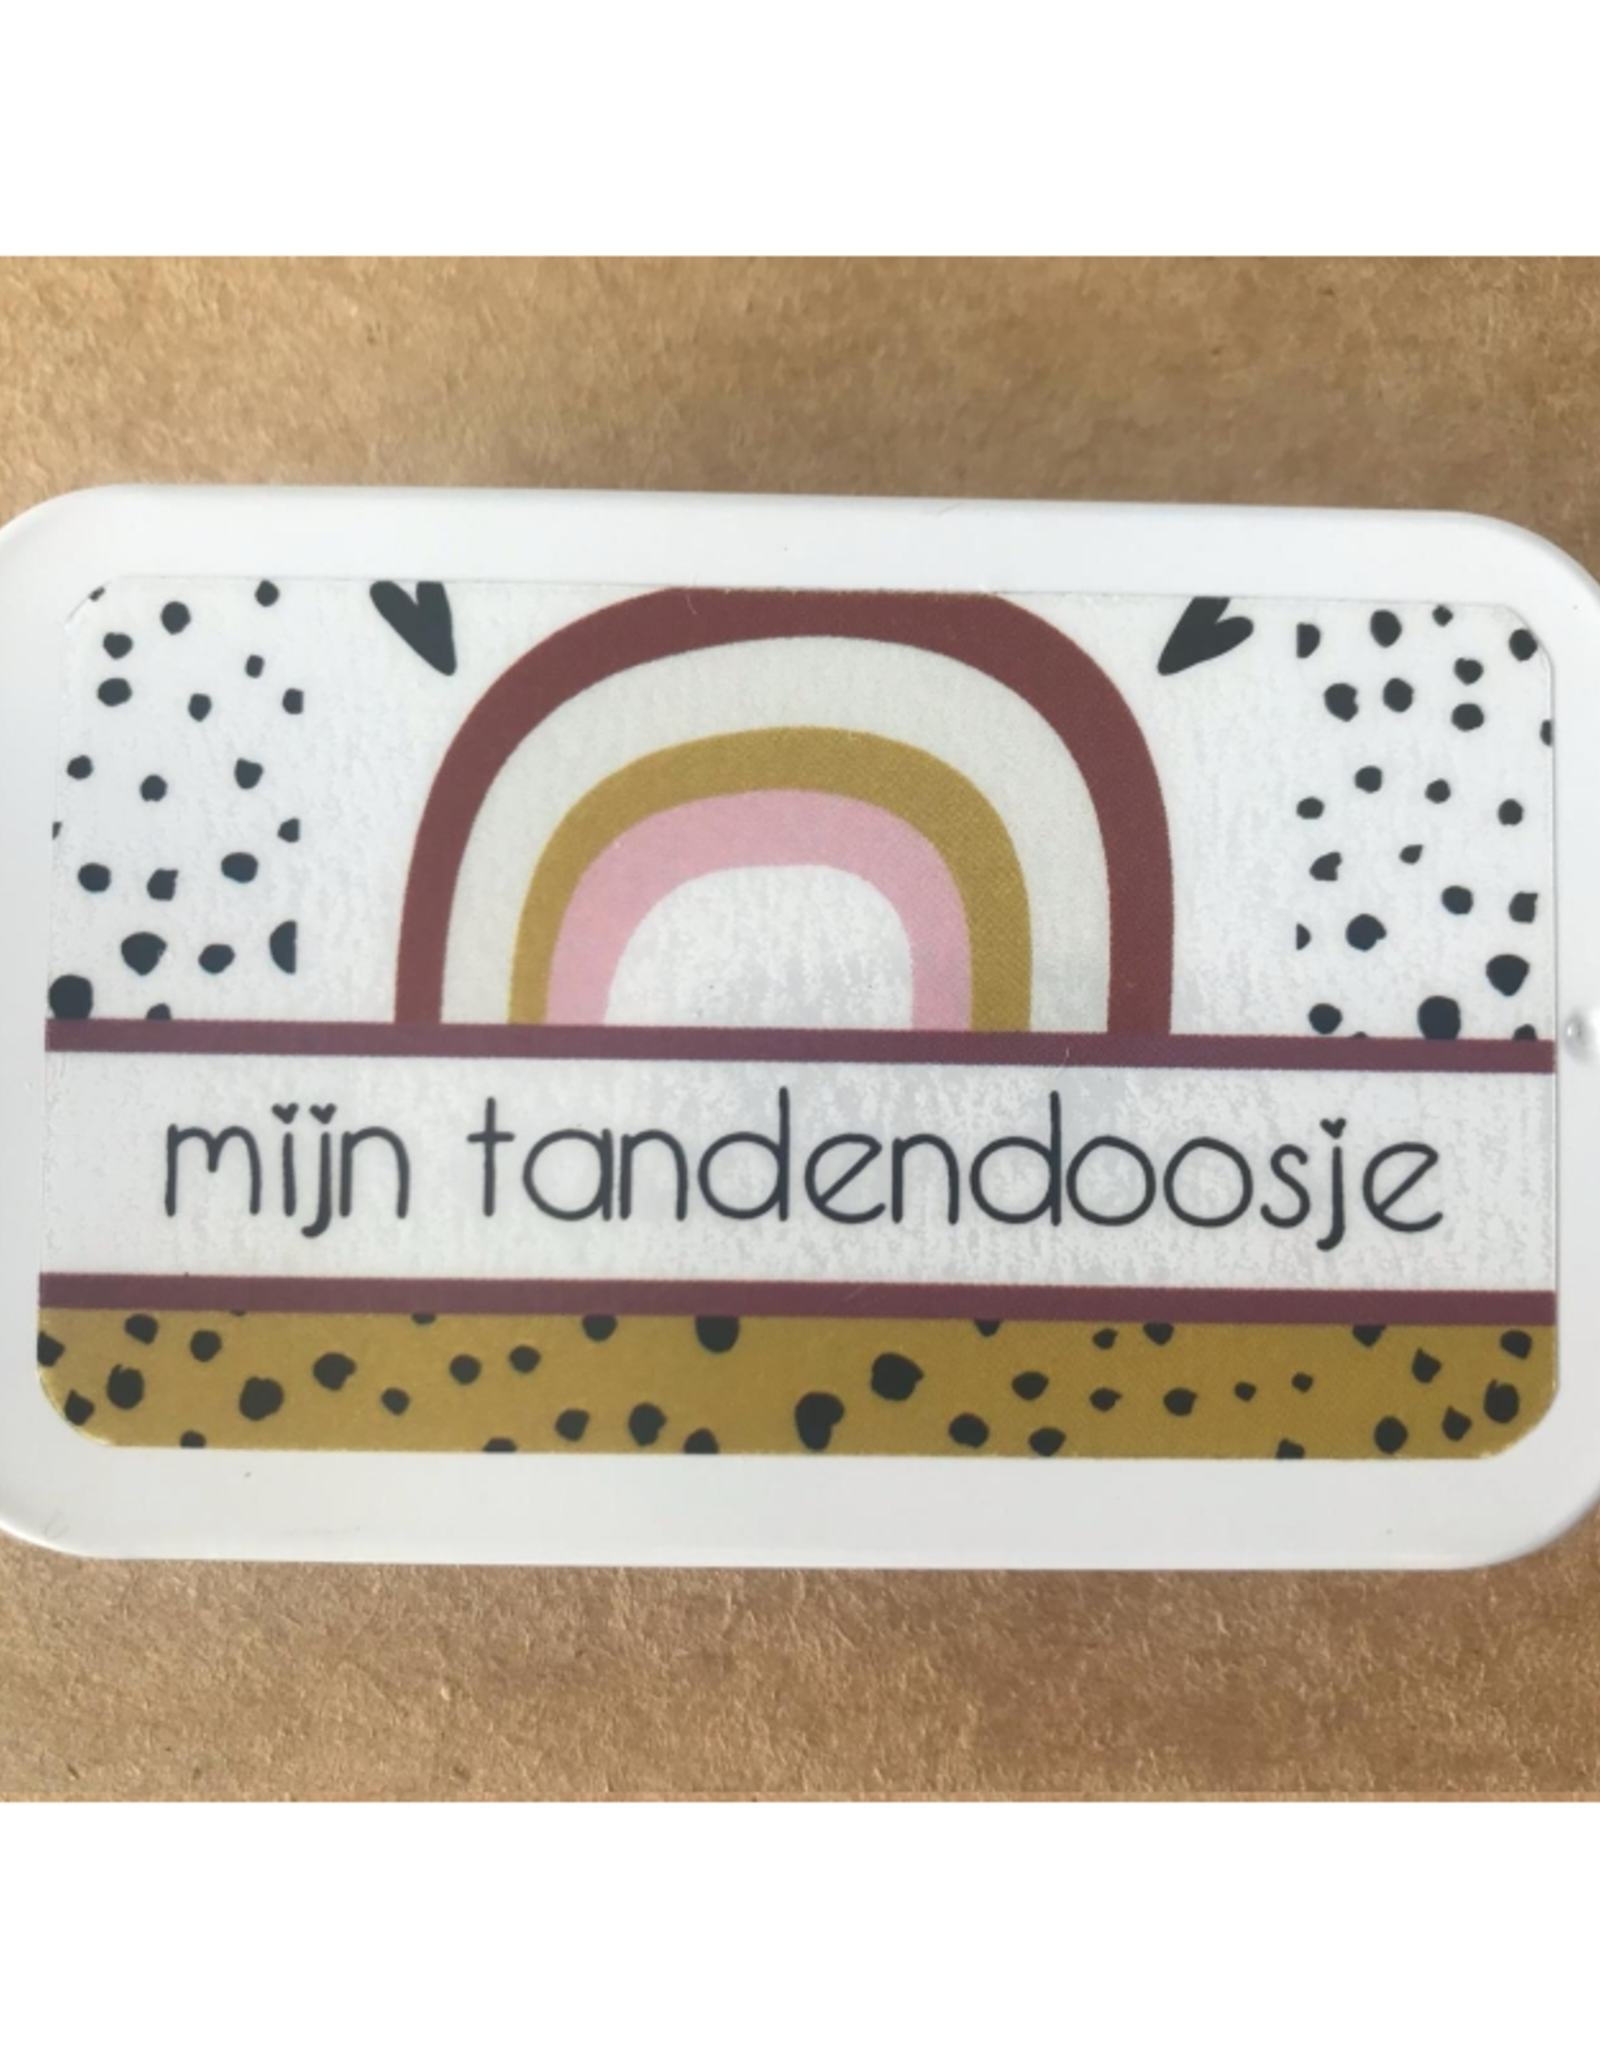 PeperMints Tandendoosje Regenboog - Pepermints